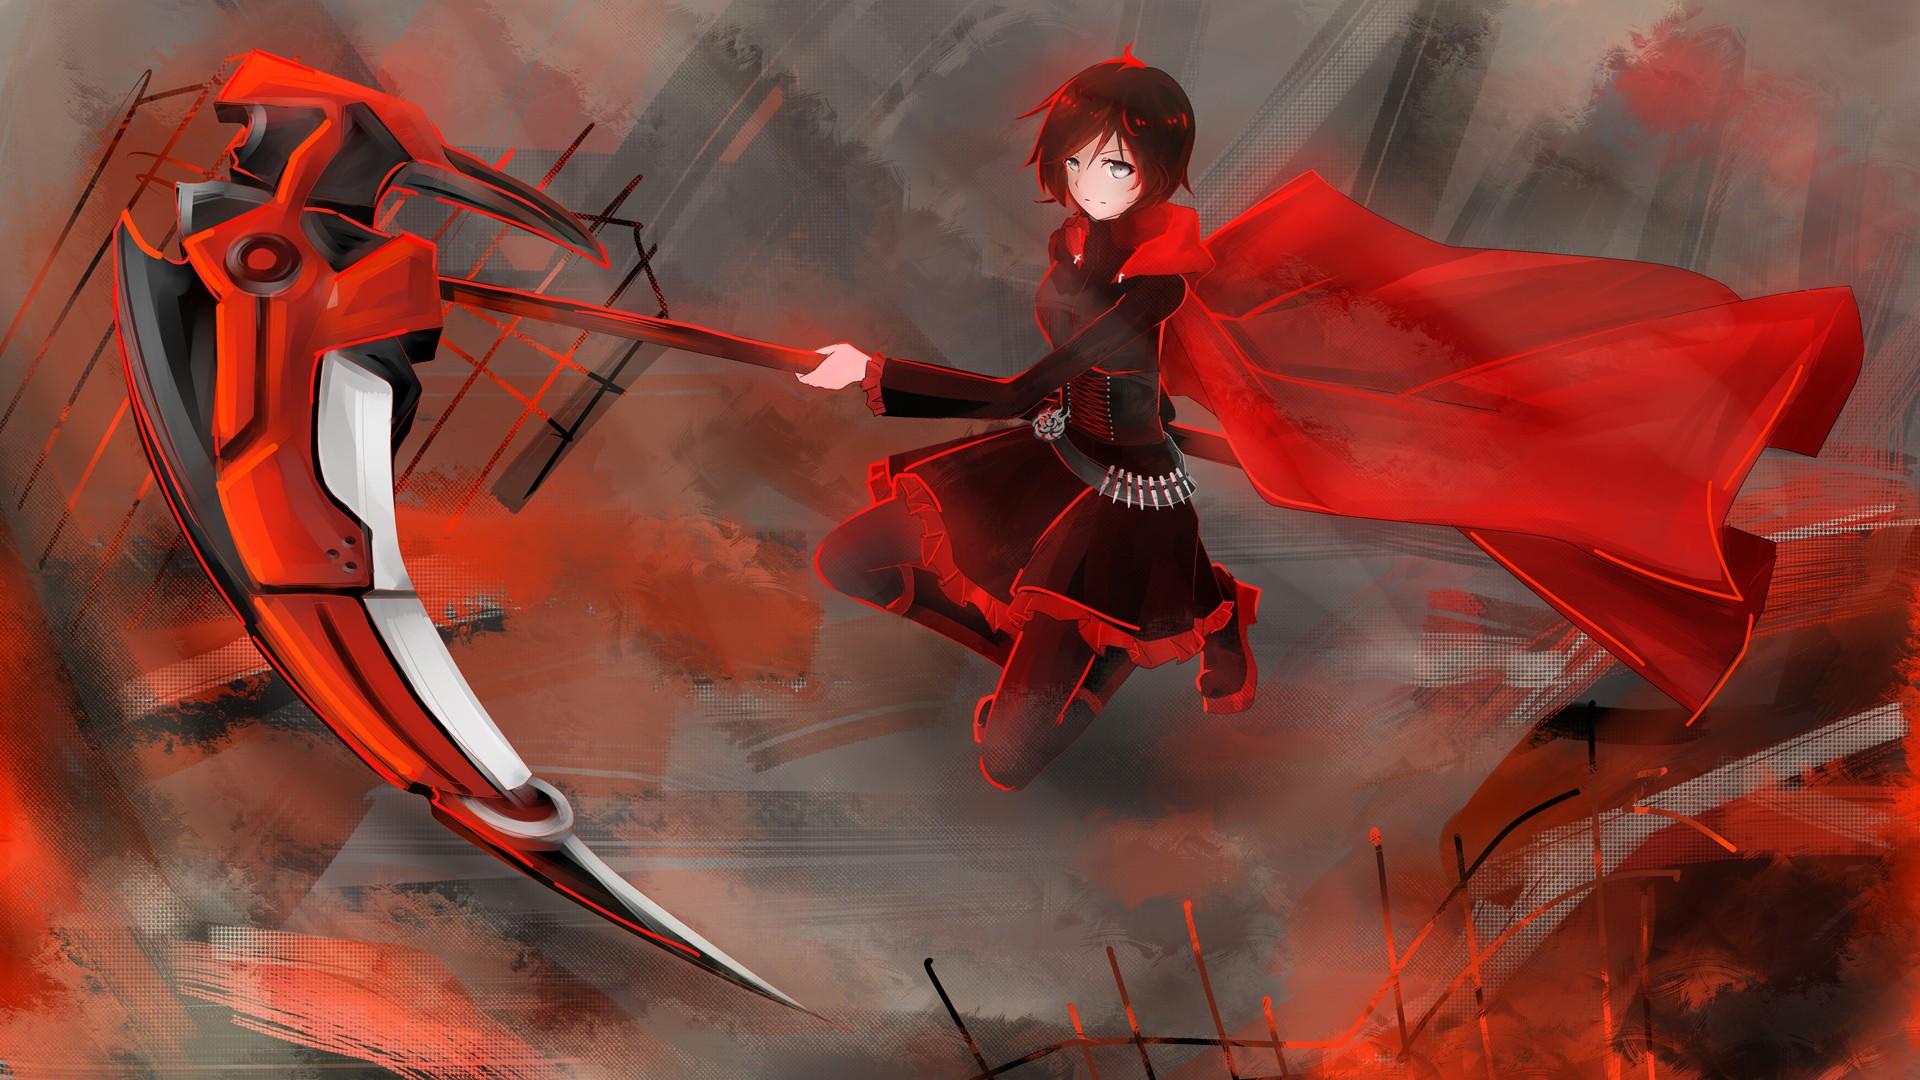 rwby anime scythe wallpaper - photo #2